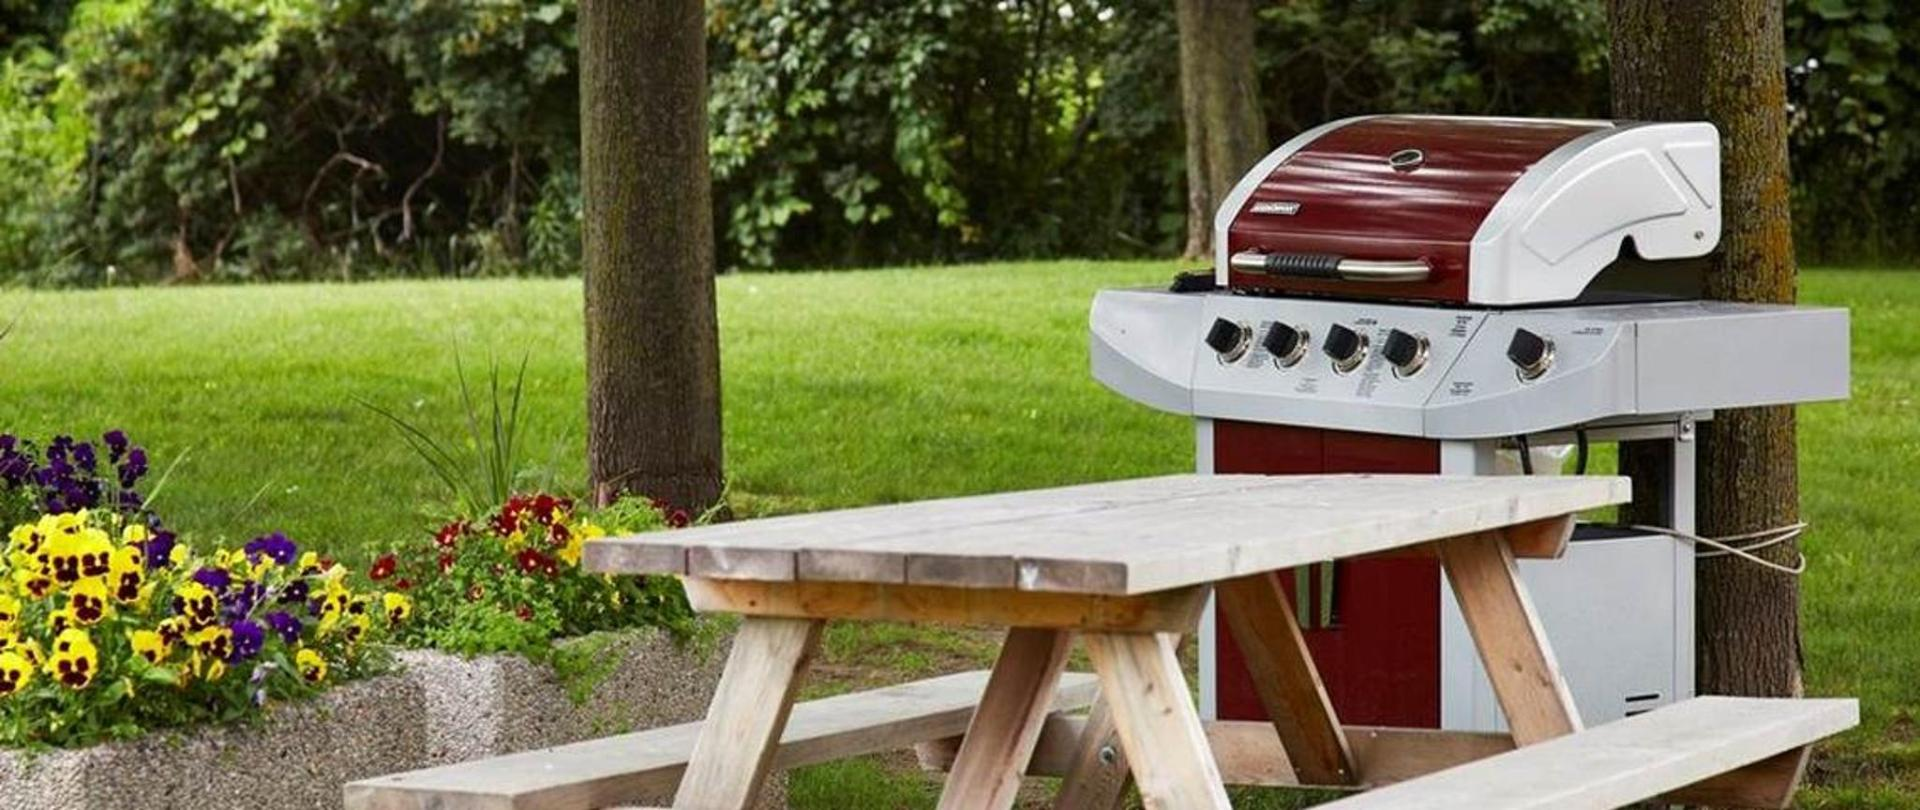 enjoy-our-picnic-and-bbq-area.jpg.1140x481_default.jpg